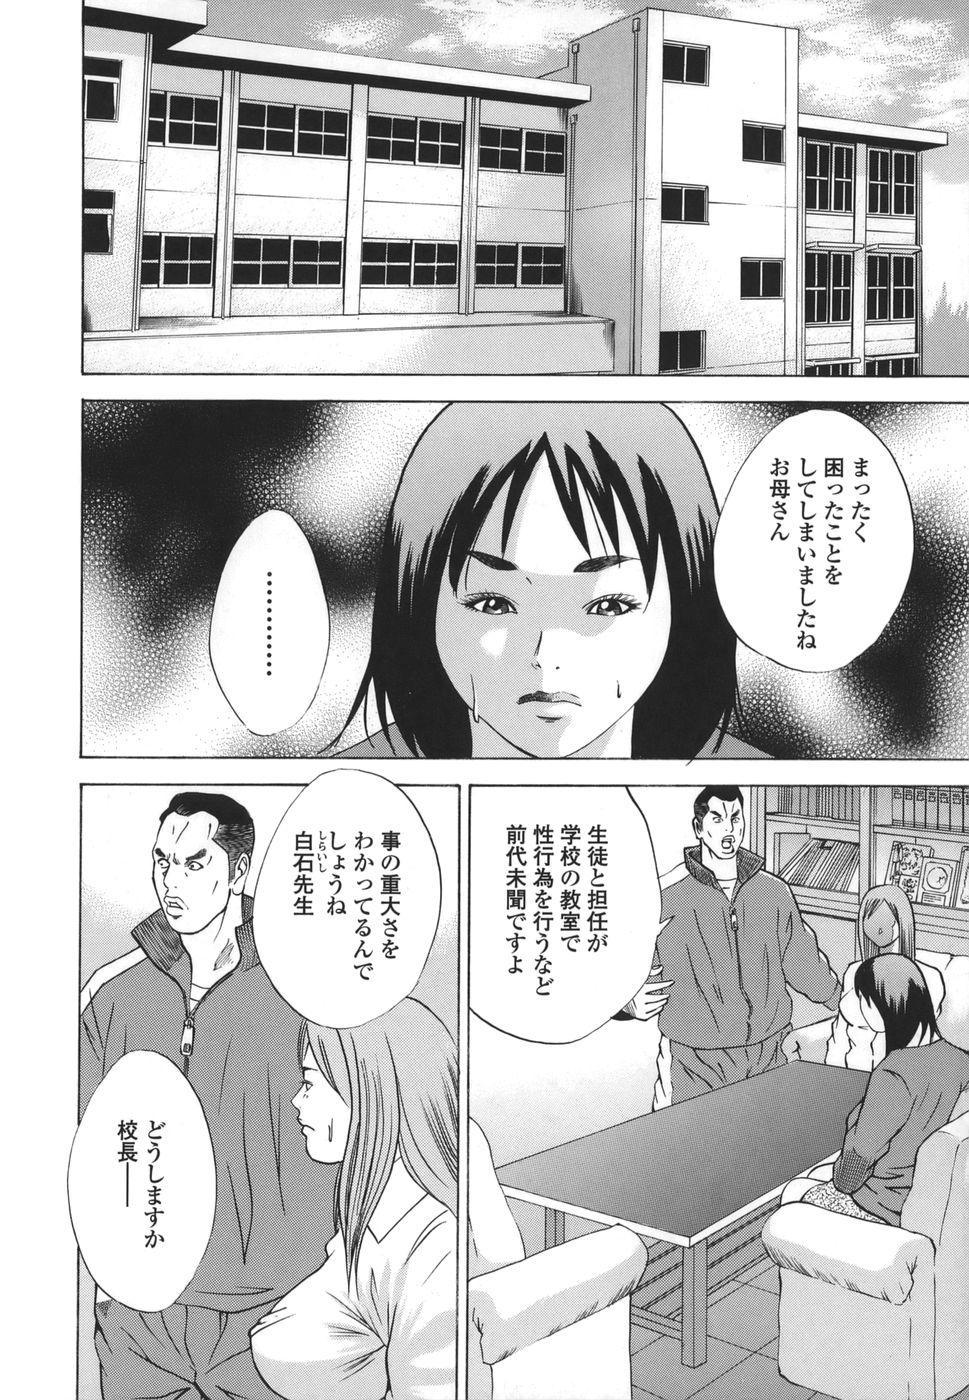 Kinshin Goukan - Near Relation Rapes 187